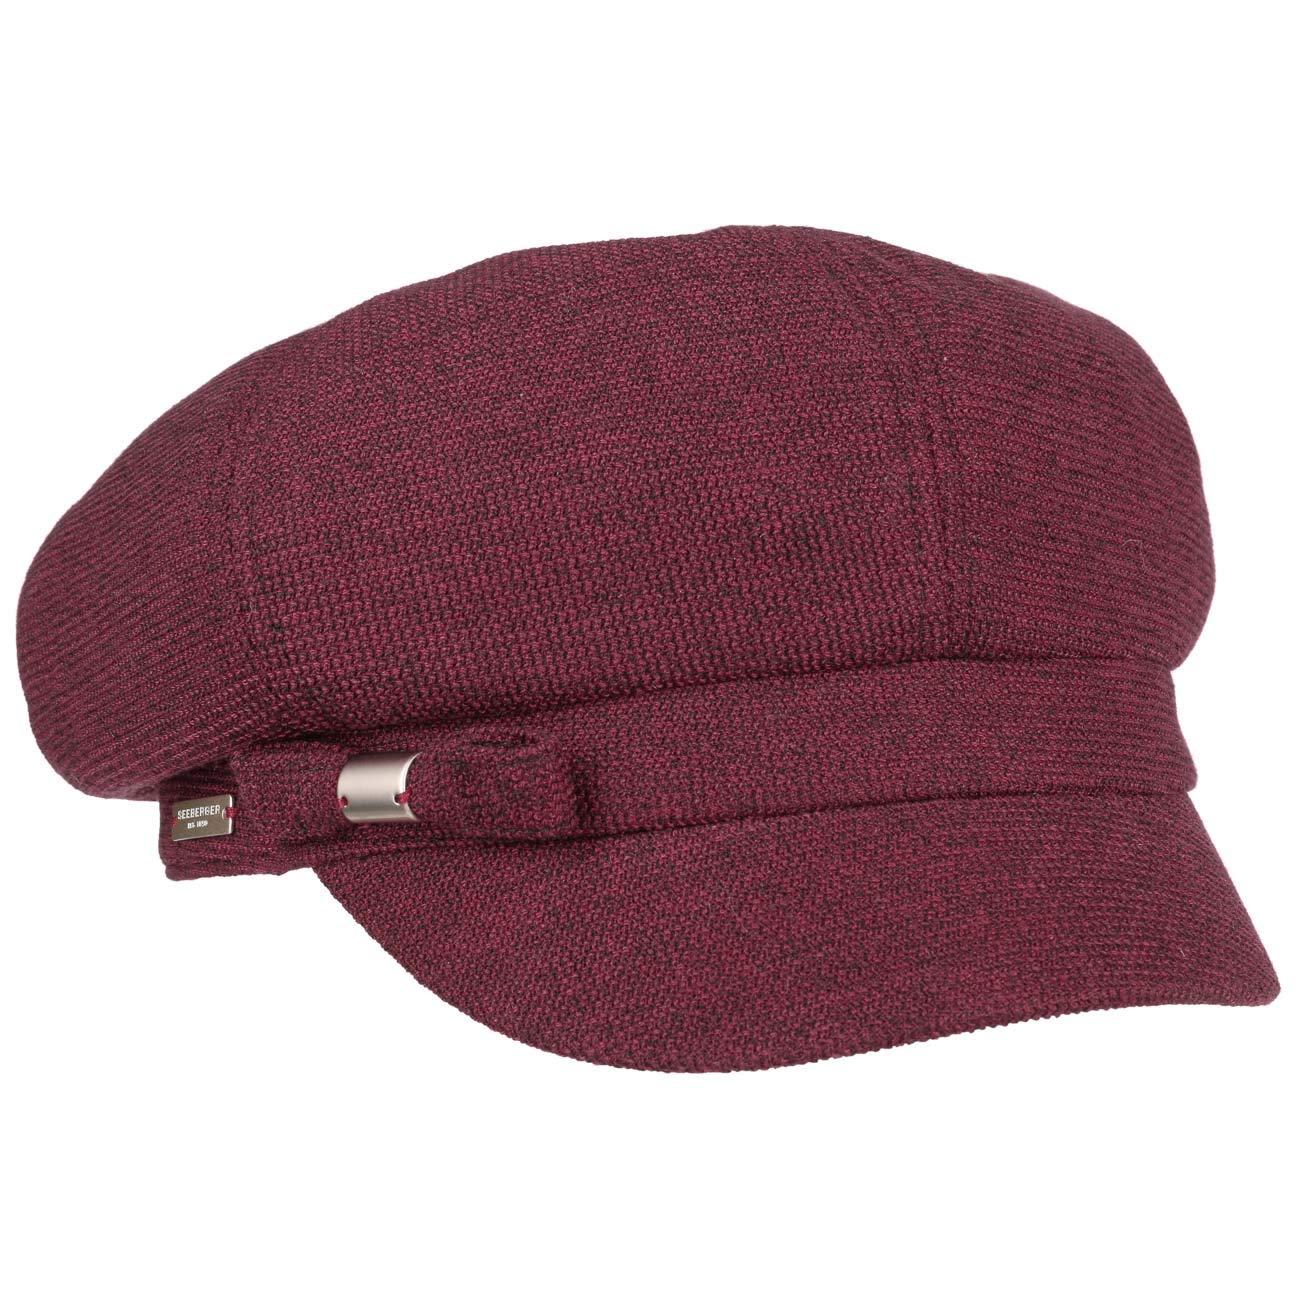 Seeberger Mella Ballonm/ütze Schirmm/ütze Schildm/ütze Baker-Boy-Hat Newsboy-M/ütze Damencap Wollcap Mit Schirm